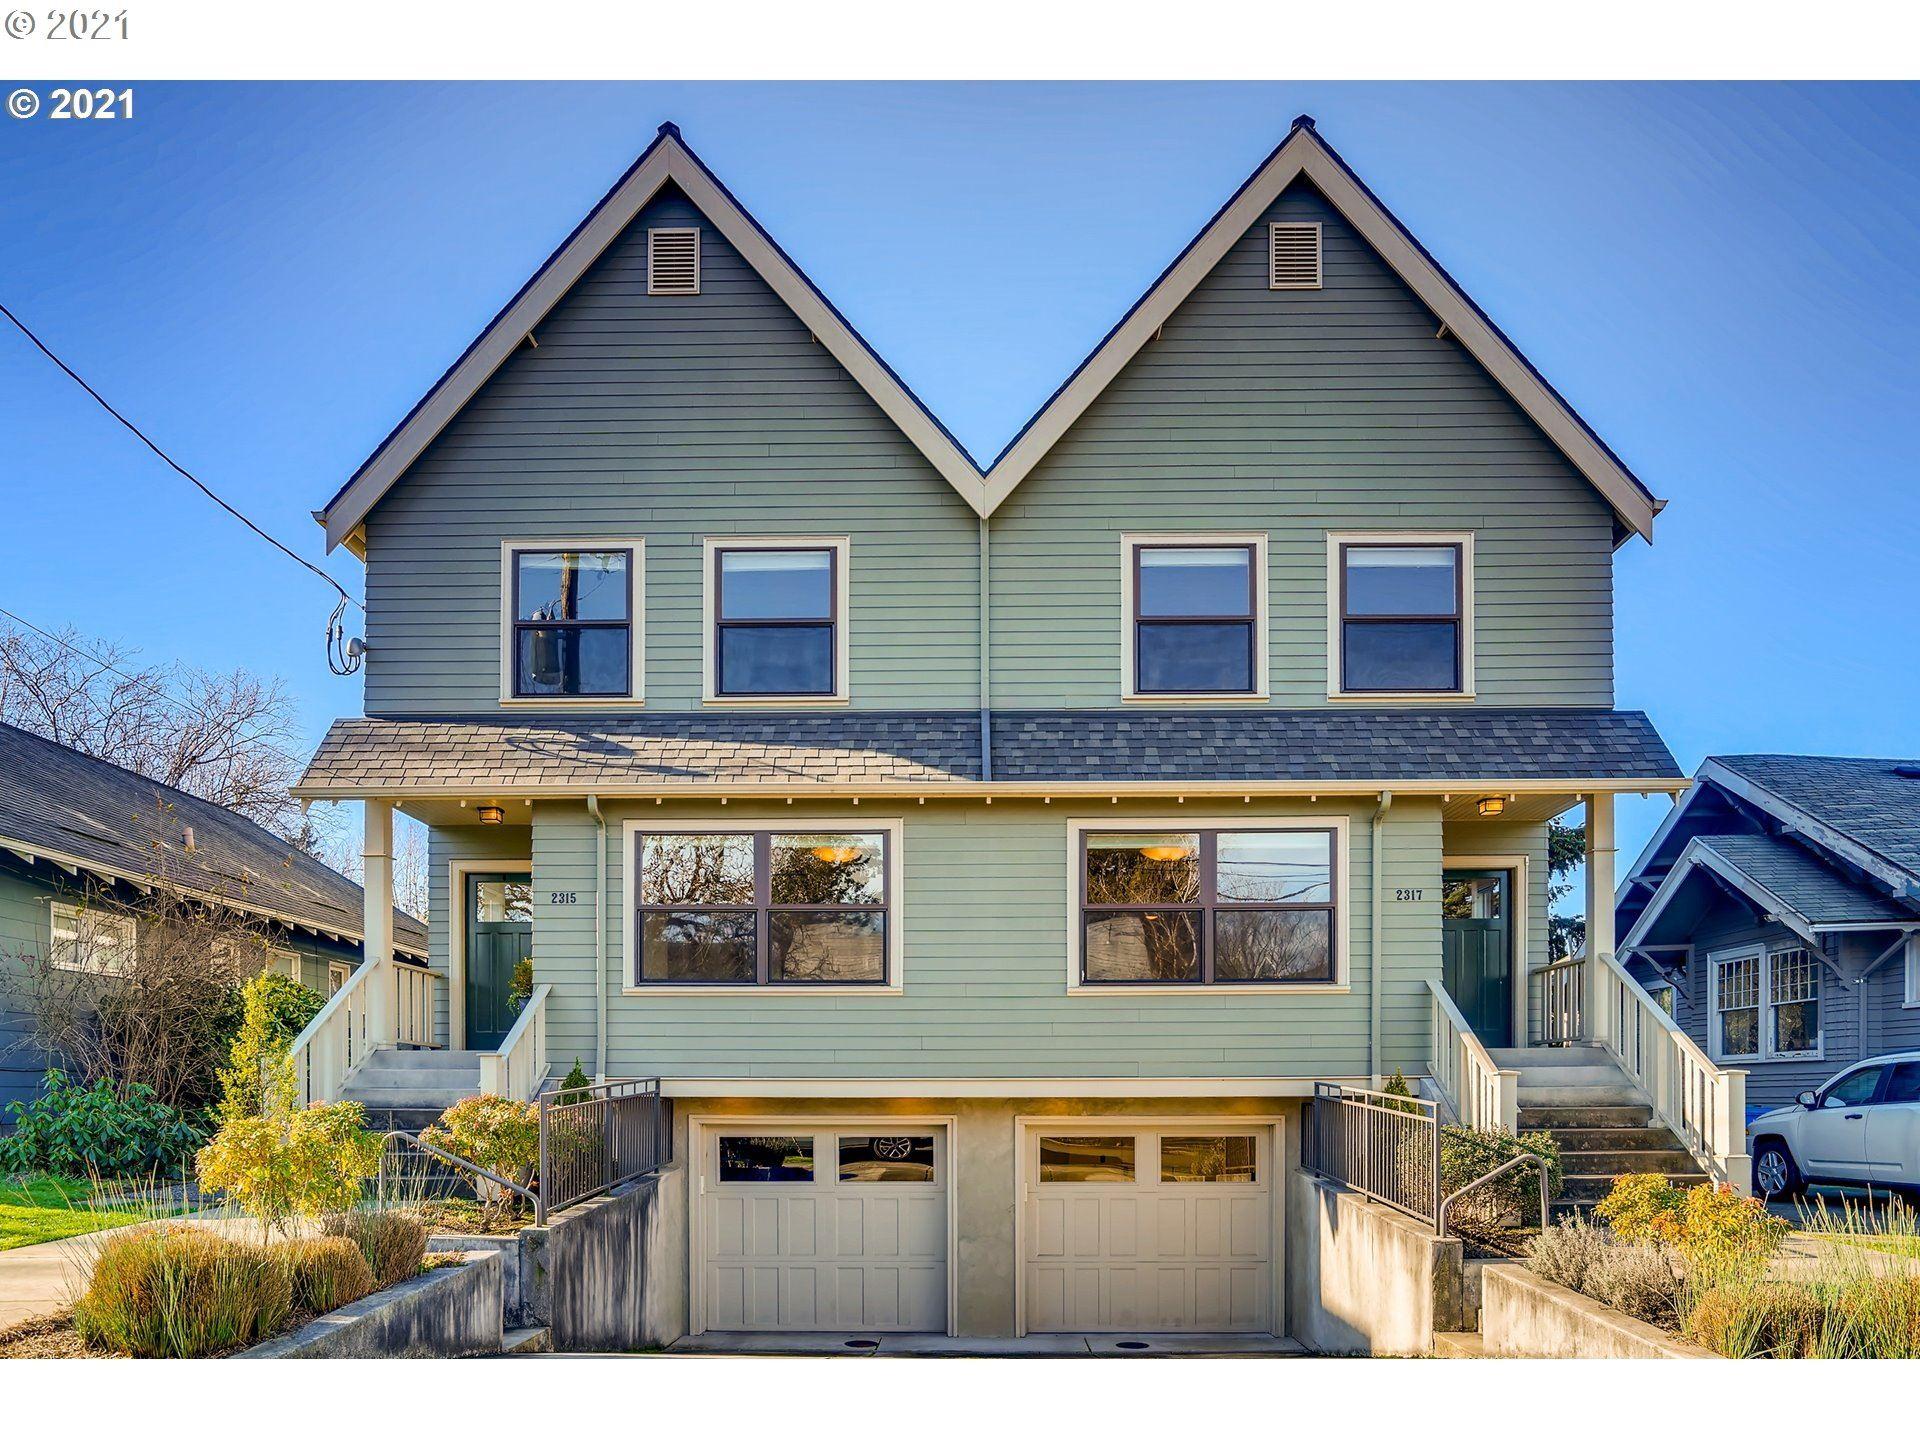 2315 NE 52ND AVE, Portland, OR 97213 - MLS#: 21677759